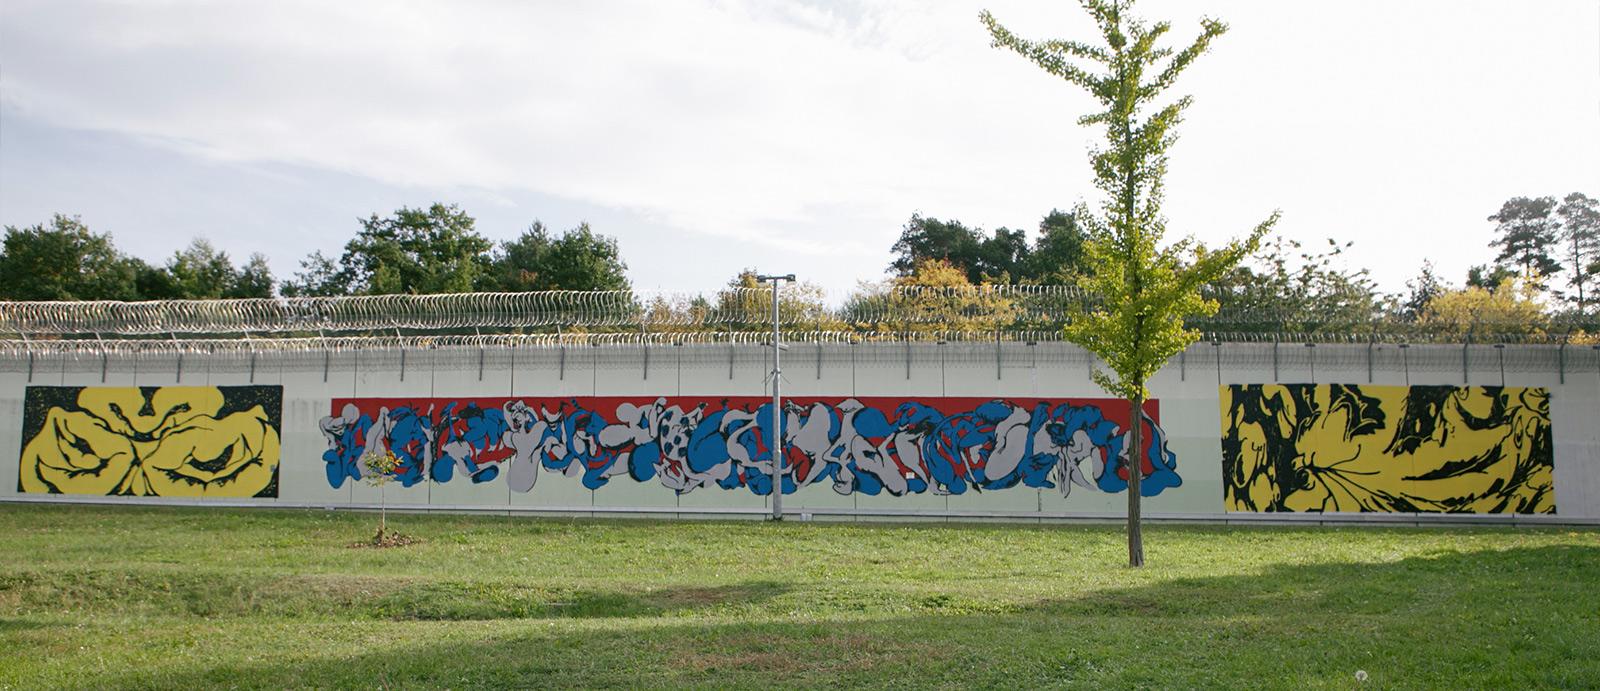 draw-a-line-inside-rockenberg-art-youth-prison-03